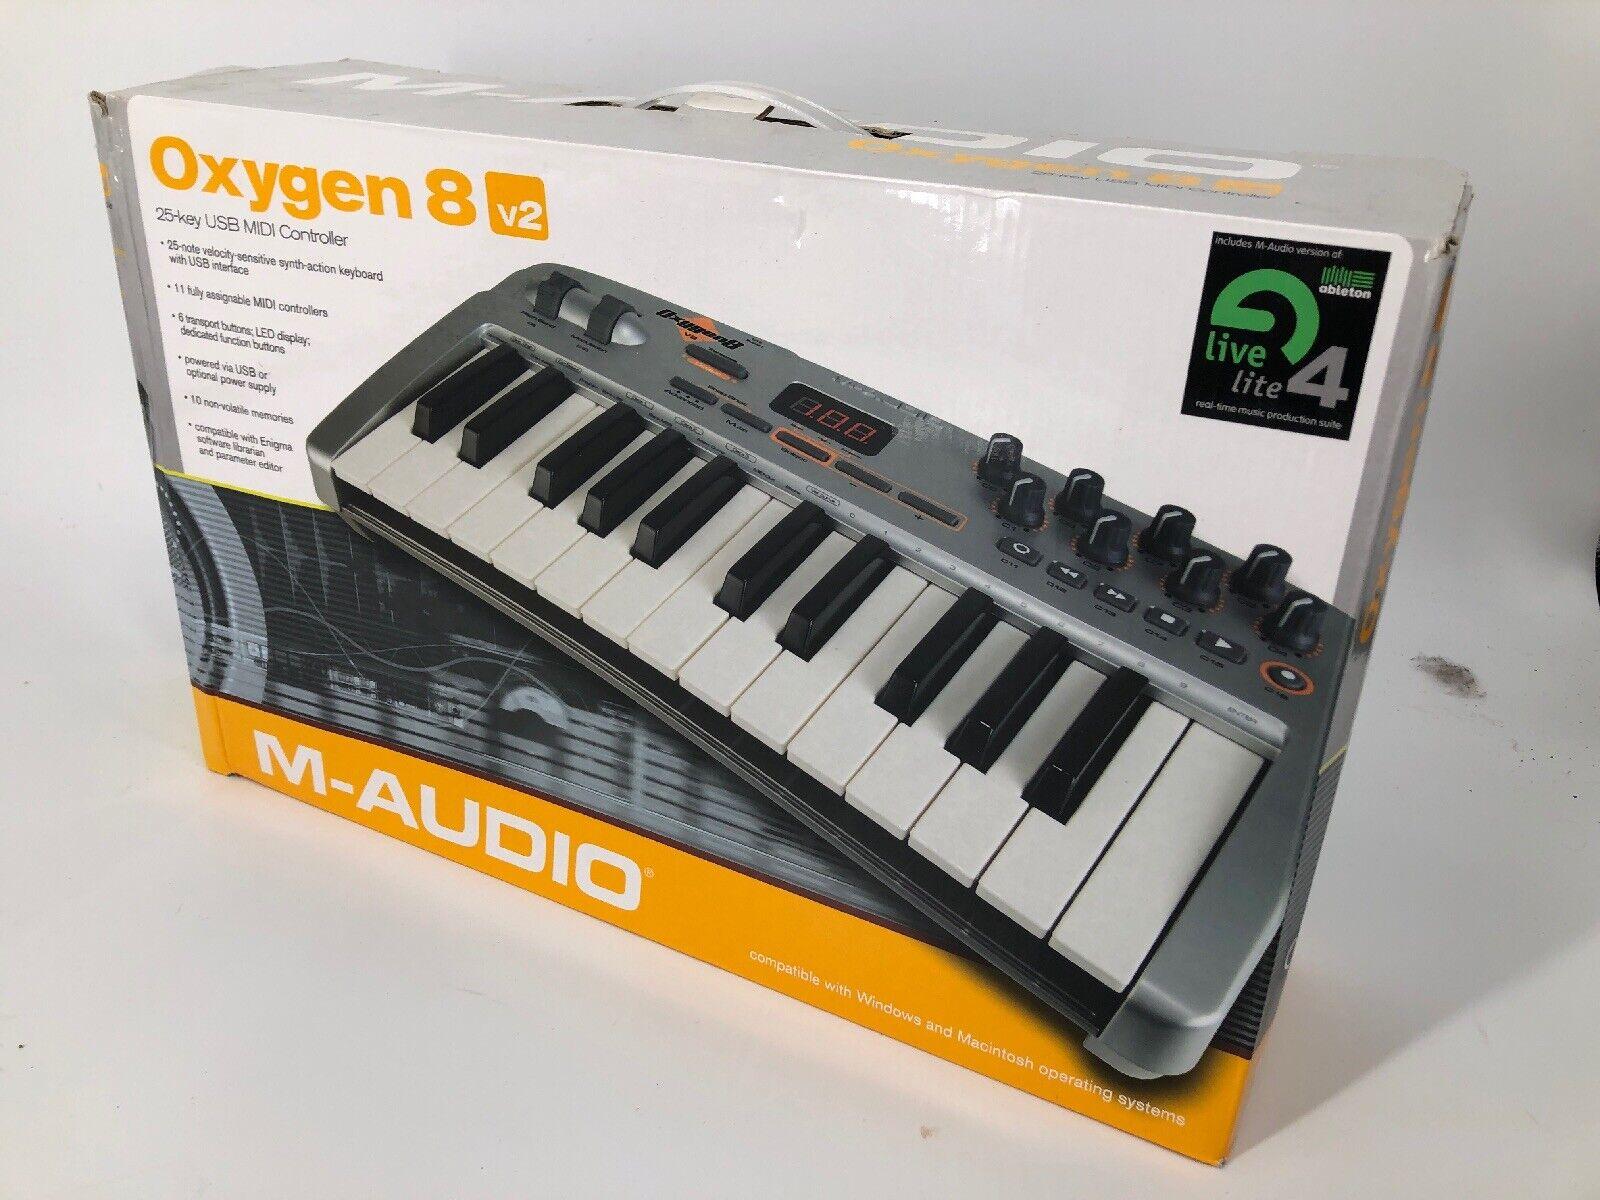 M-AUDIO OXYGEN 8 V2 KEYBOARD 25-KEY USB MIDI CONTROLLER in Box